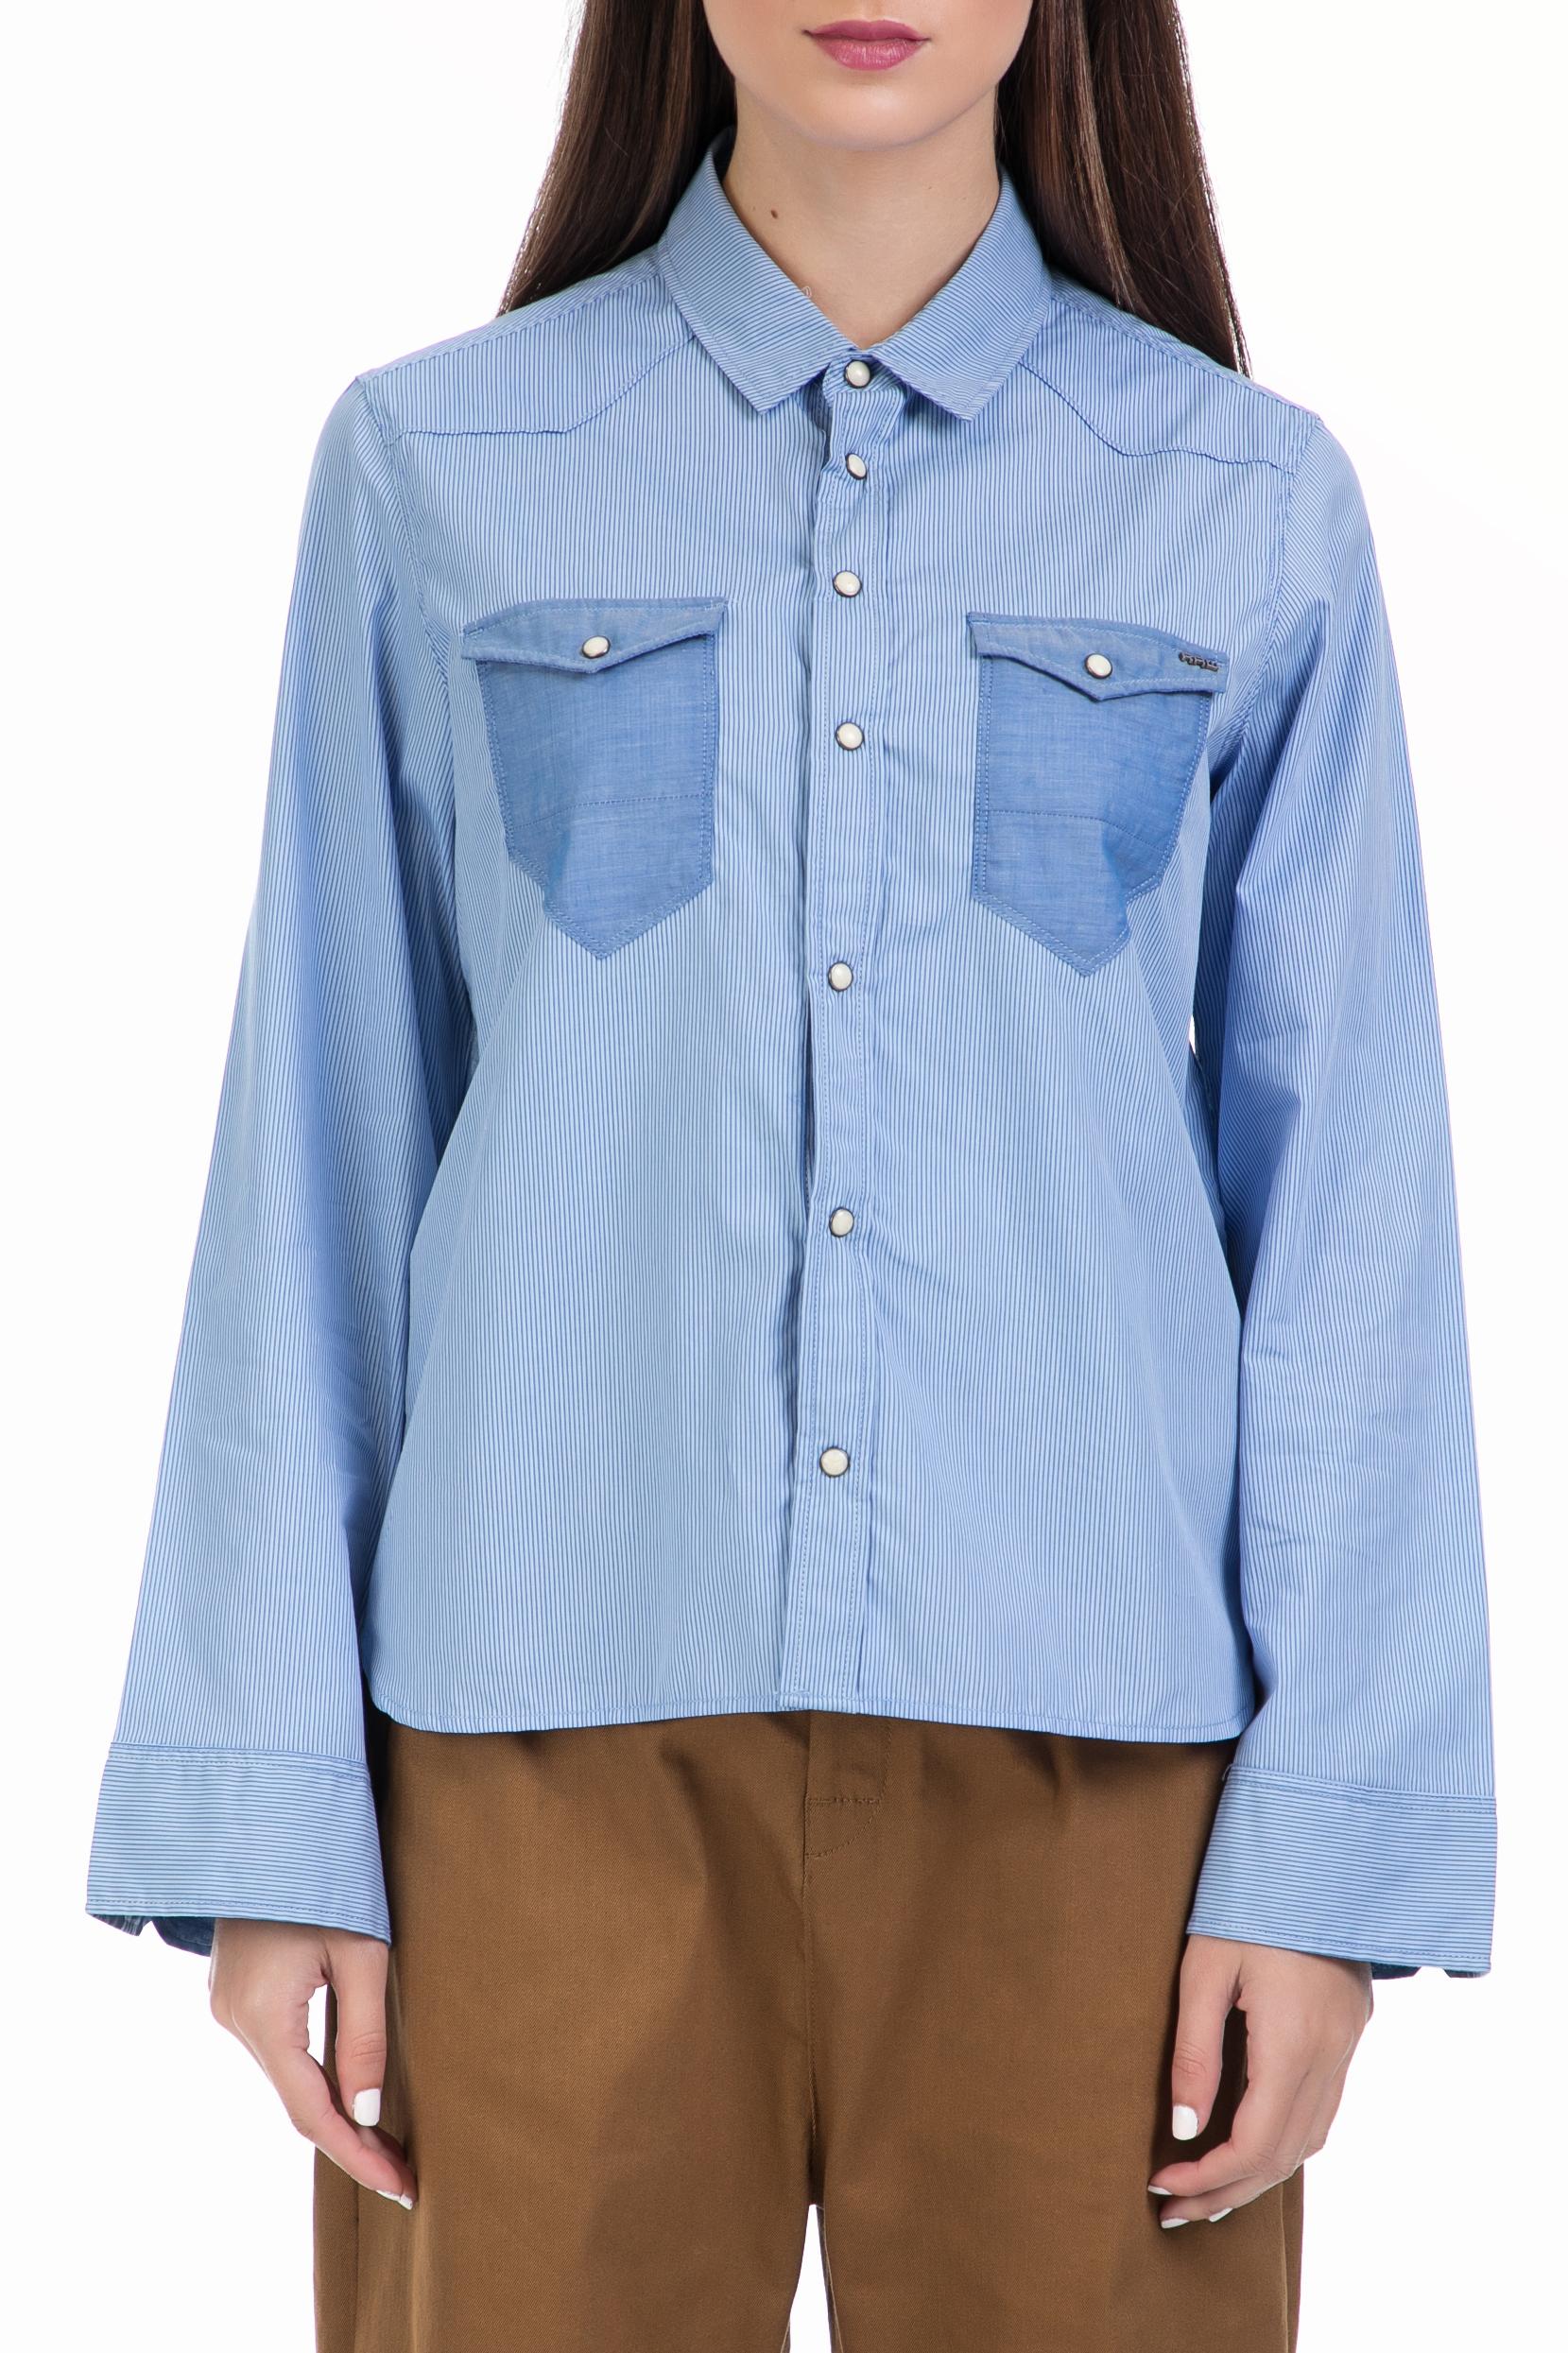 G-STAR RAW - Γυναικείο πουκάμισο Tacoma wide slv bf croppe μπλε